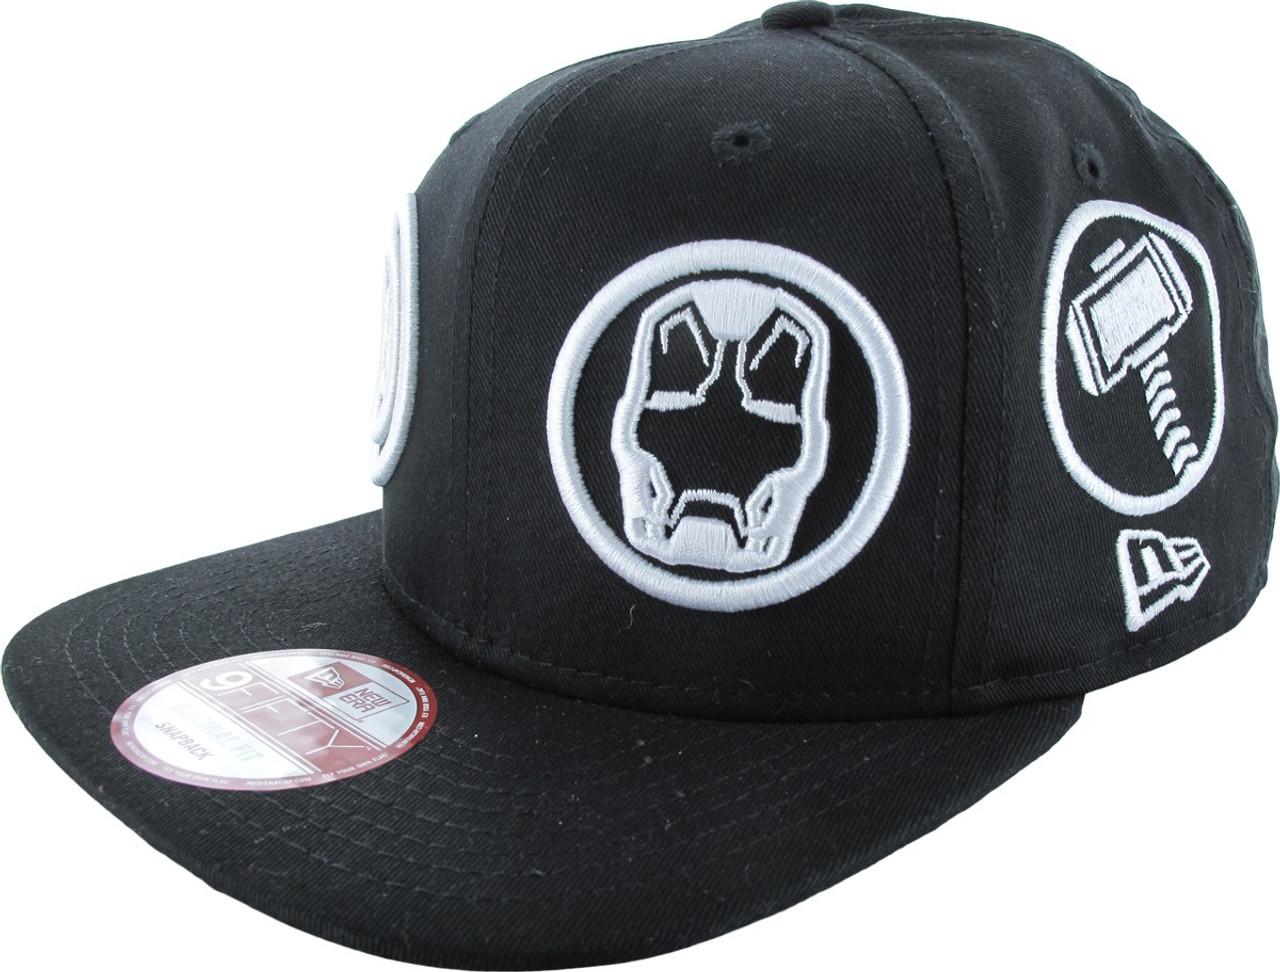 875ea15e213 avengers-team-icons-wrap-9fifty-snapback-hat -21  41125.1512311762.jpg c 2 imbypass on